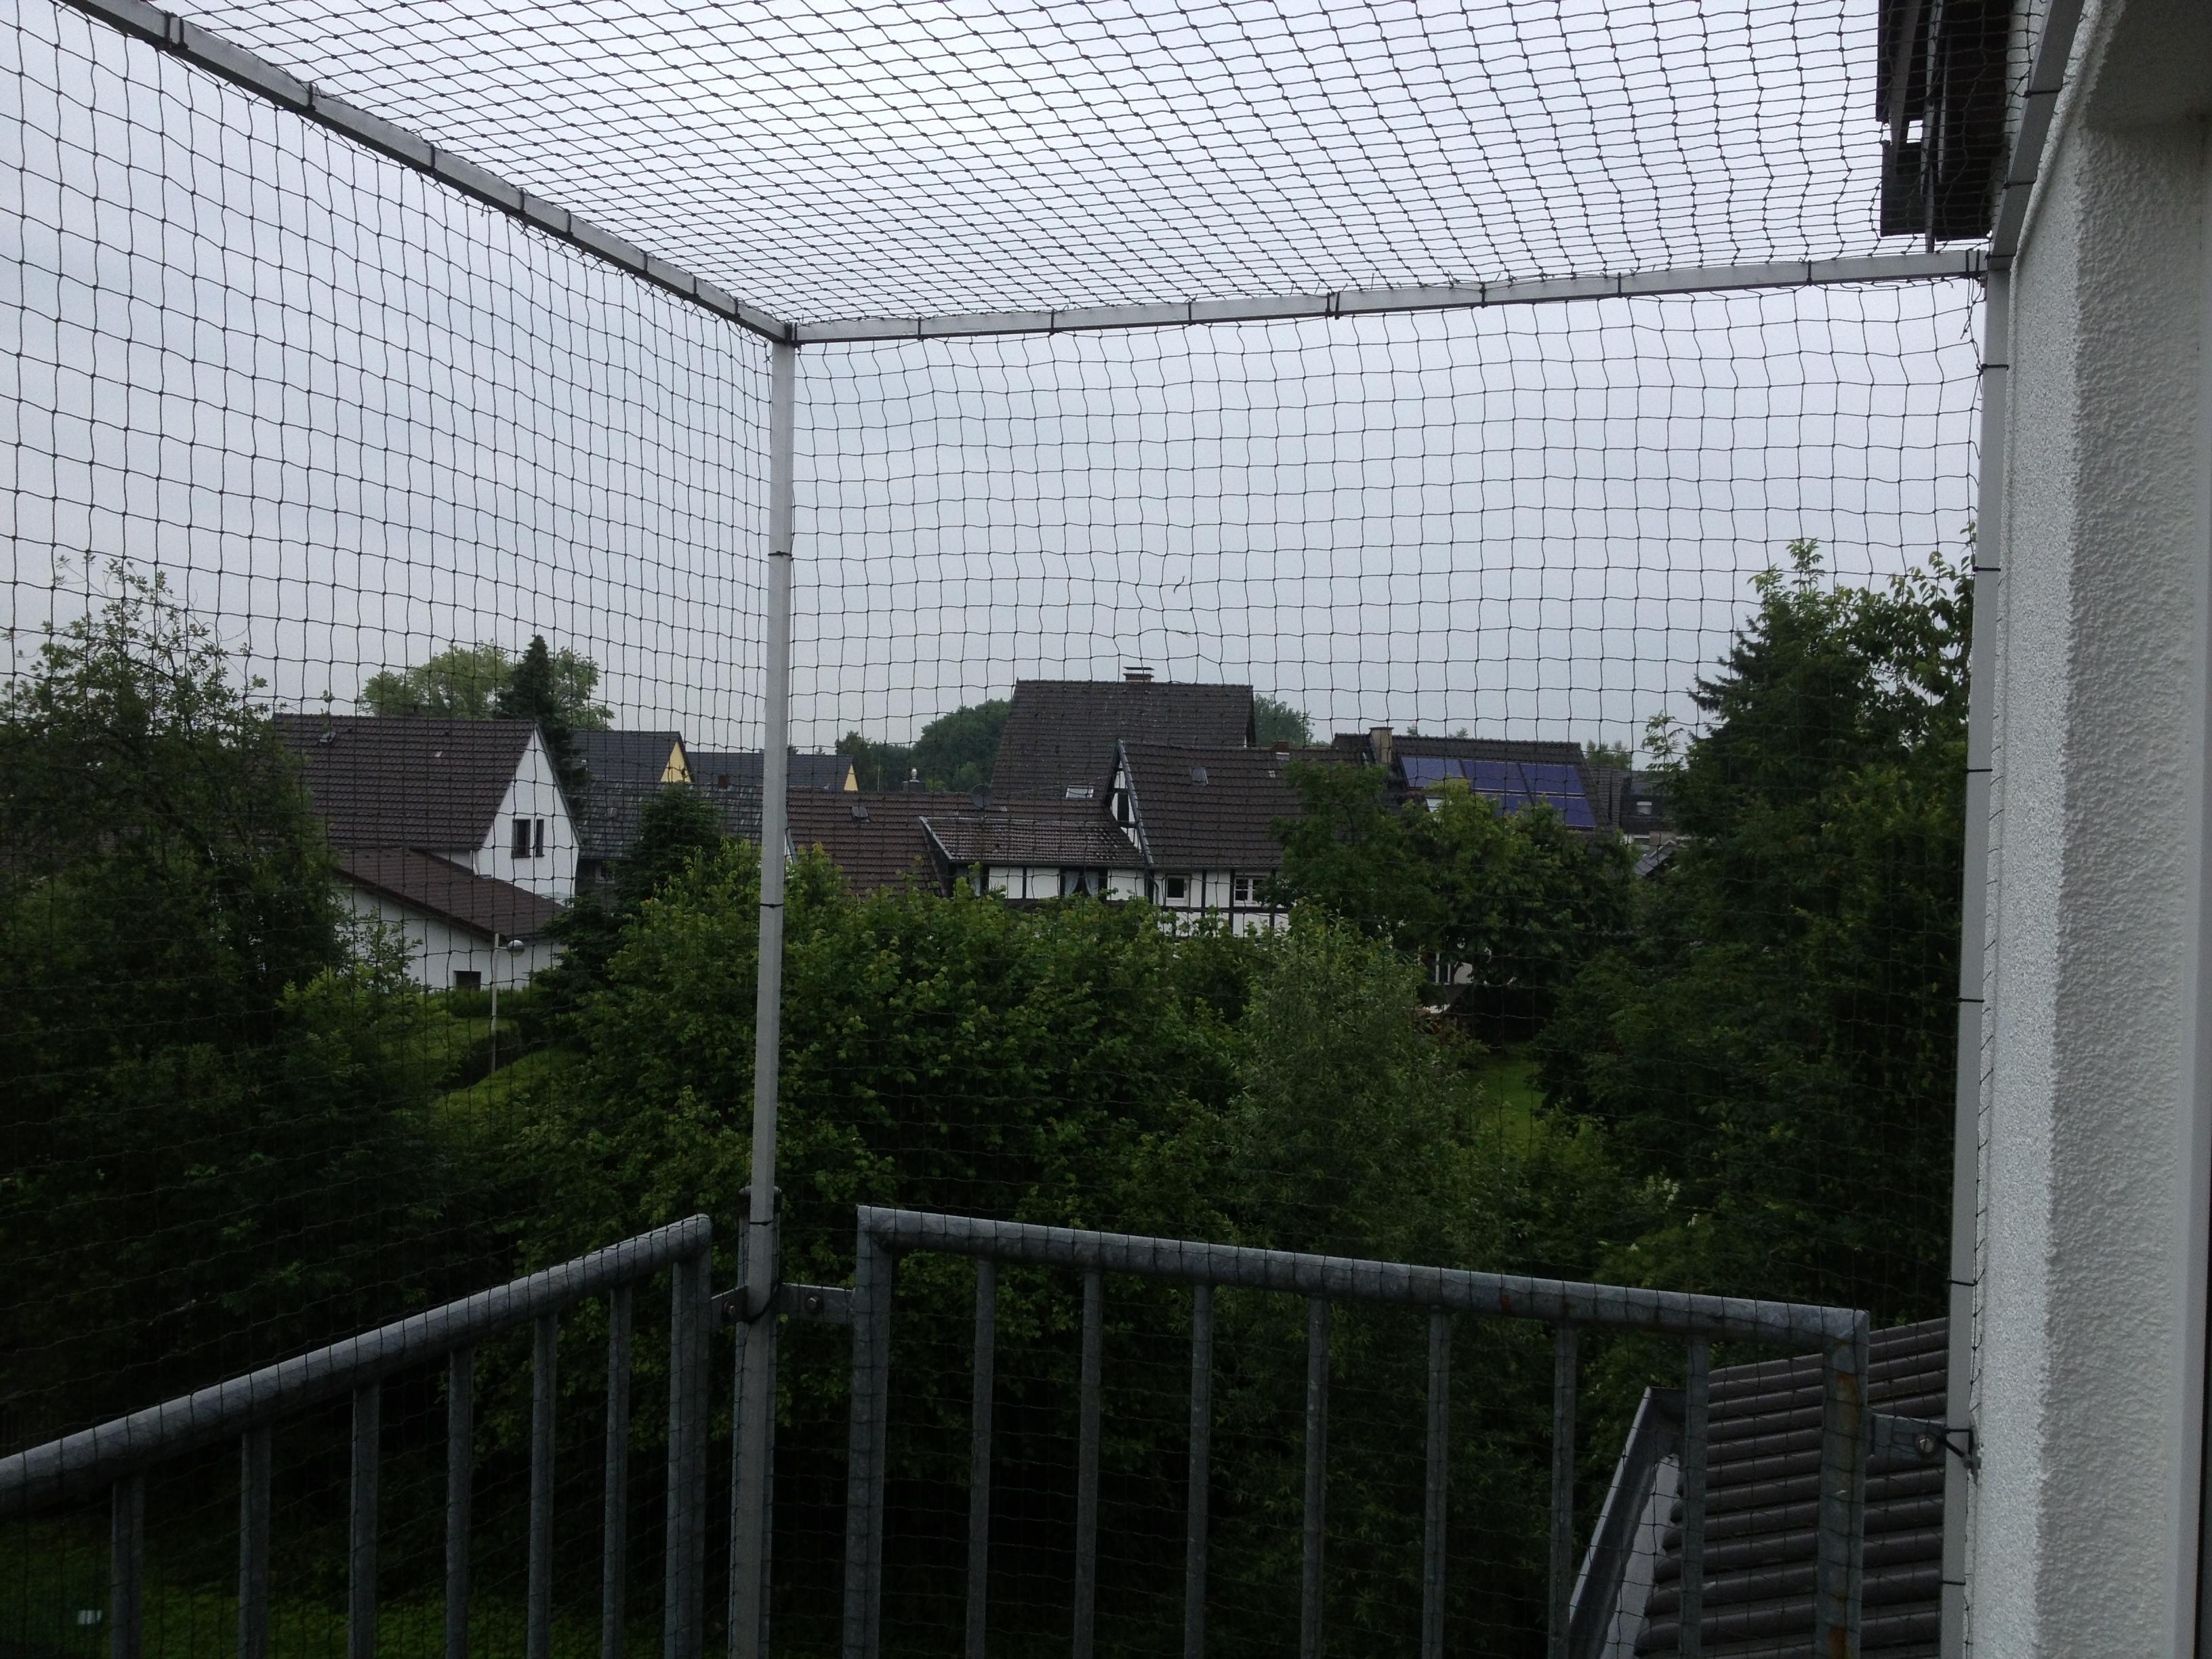 katzennetz f r balkon in bonn fenster katzensicher machen. Black Bedroom Furniture Sets. Home Design Ideas